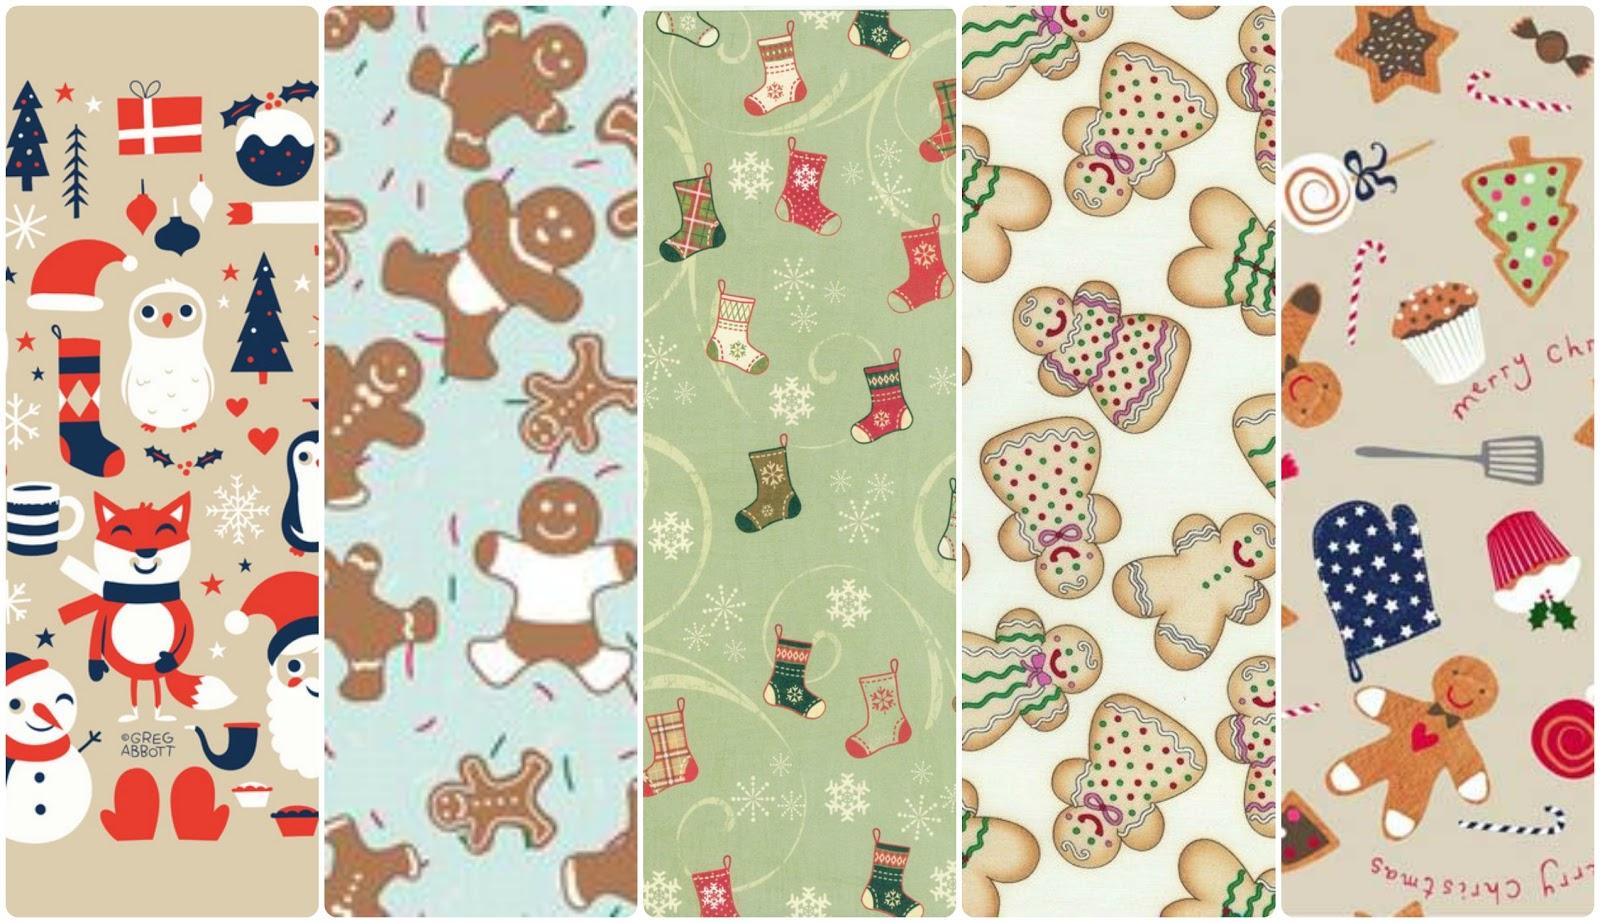 fondos de pantalla para whatsapp navidad navideños gingerbread man & xmas stocking muñequito de jenjibre y calcetines navideños free background para whatsapp móvil iphone